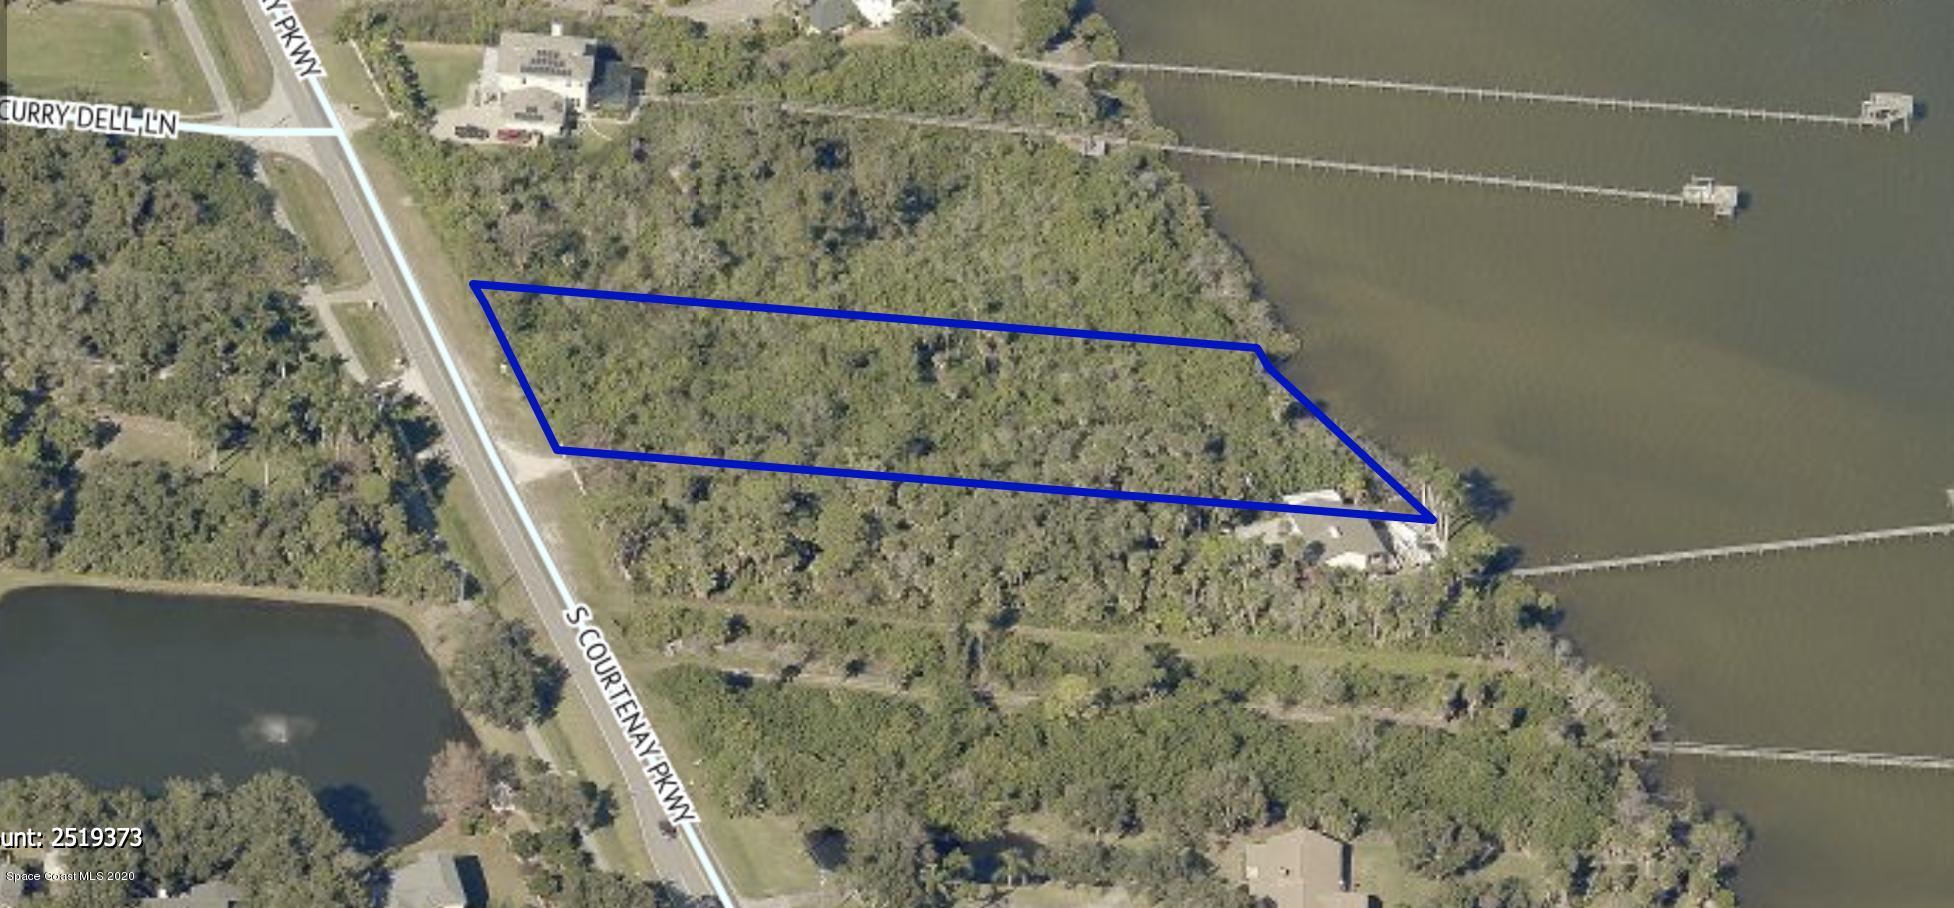 3860 S Courtenay Parkway S, Merritt Island FL 32952 - Photo 1